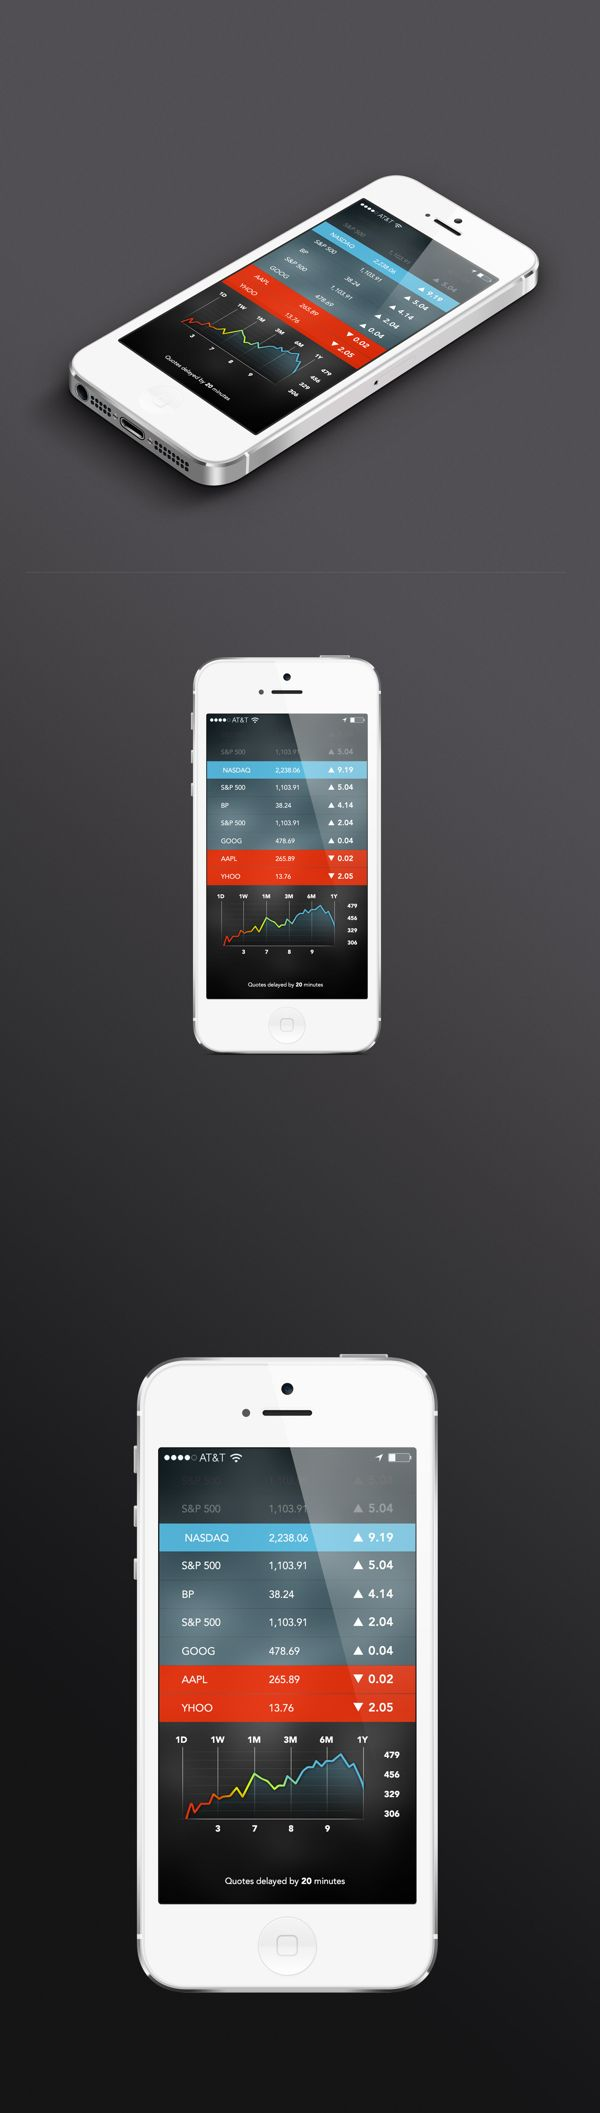 Mobile Stock app UI by Hyelim Choi, via Behance